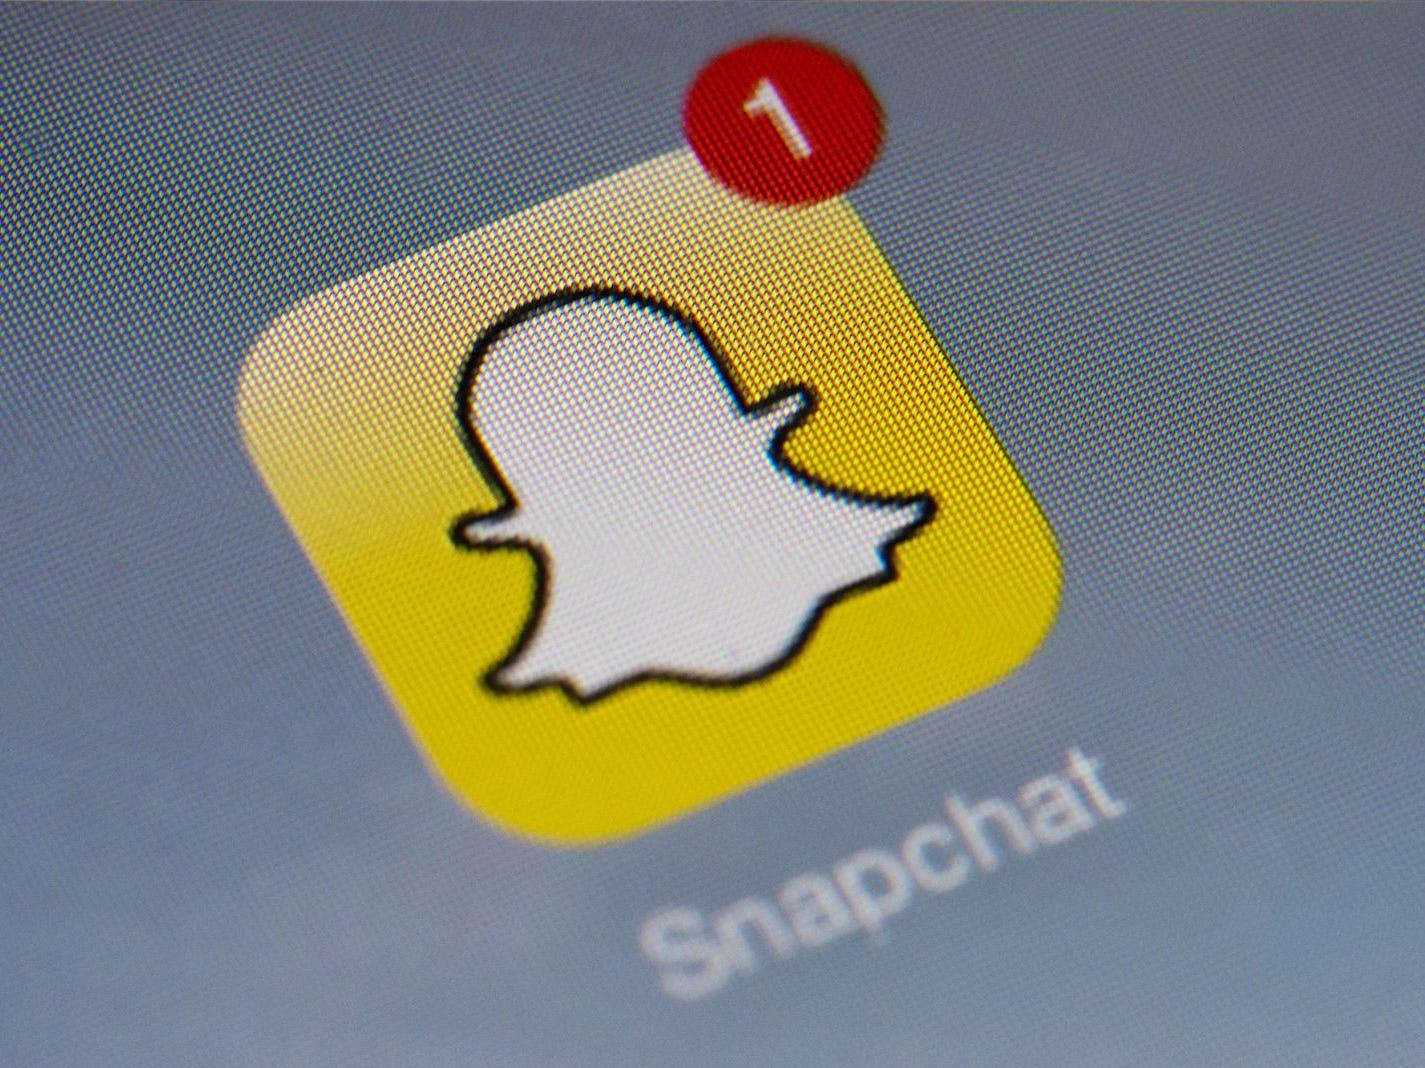 The logo of mobile app Snapchat.